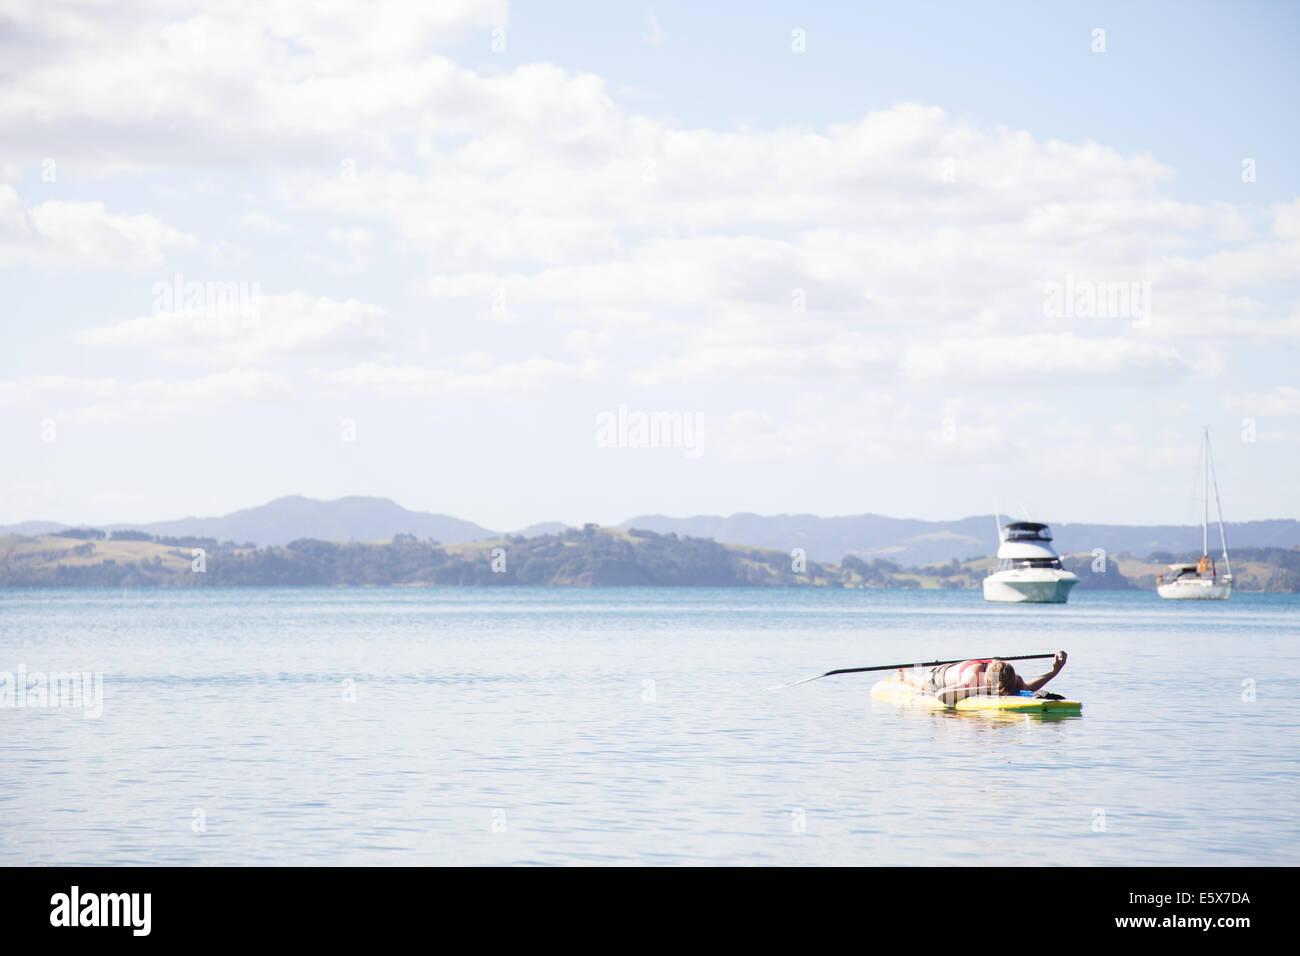 Mujer adulta media acostada paddleboarding en el mar Imagen De Stock